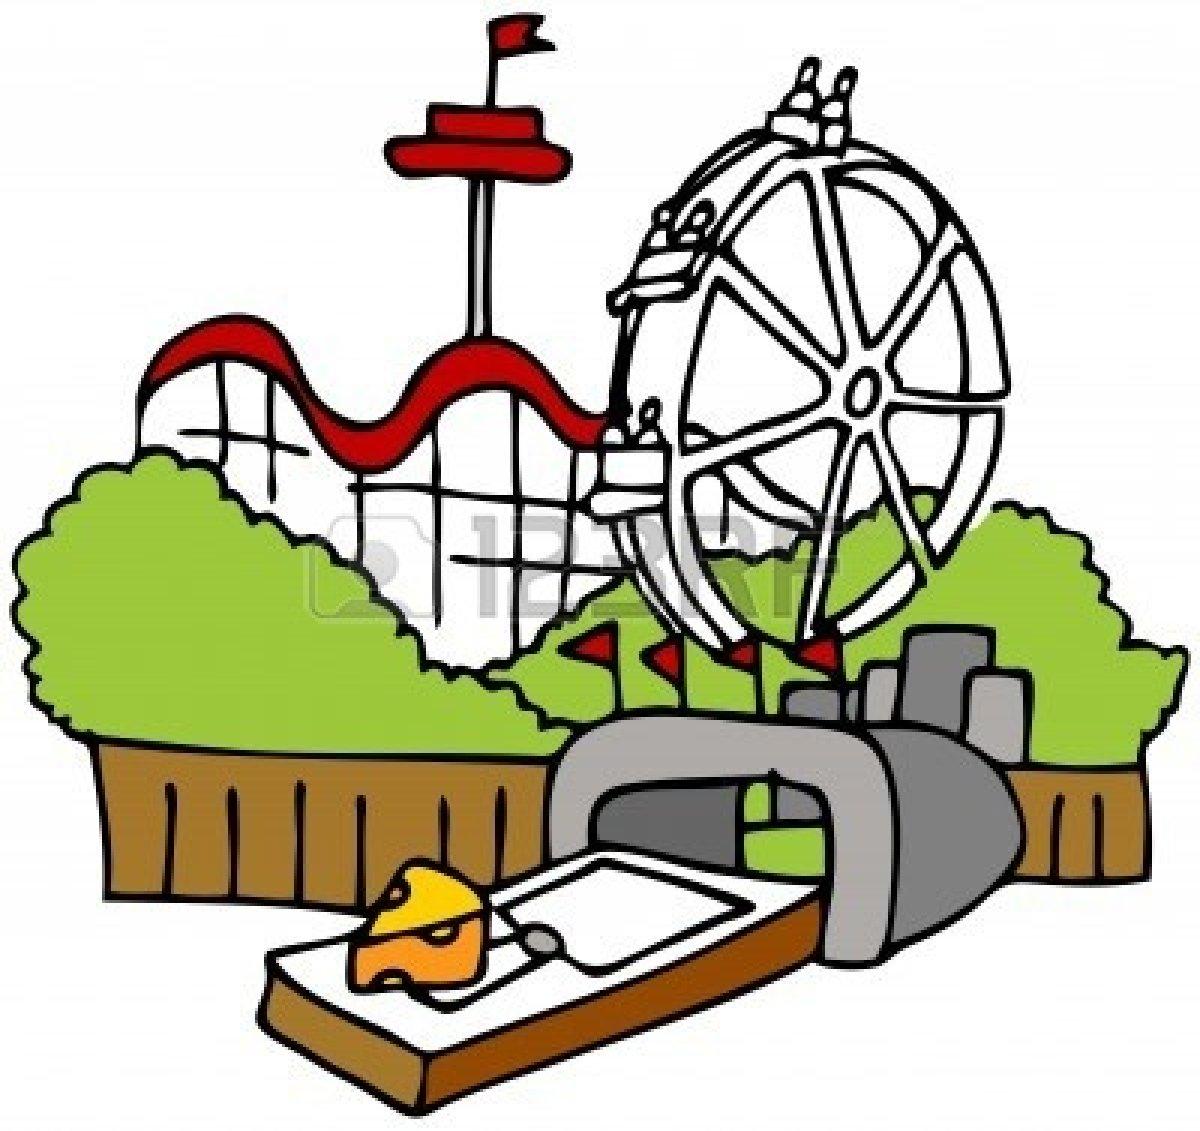 Cartoon Amusement Park Clipart-Cartoon Amusement Park Clipart-7